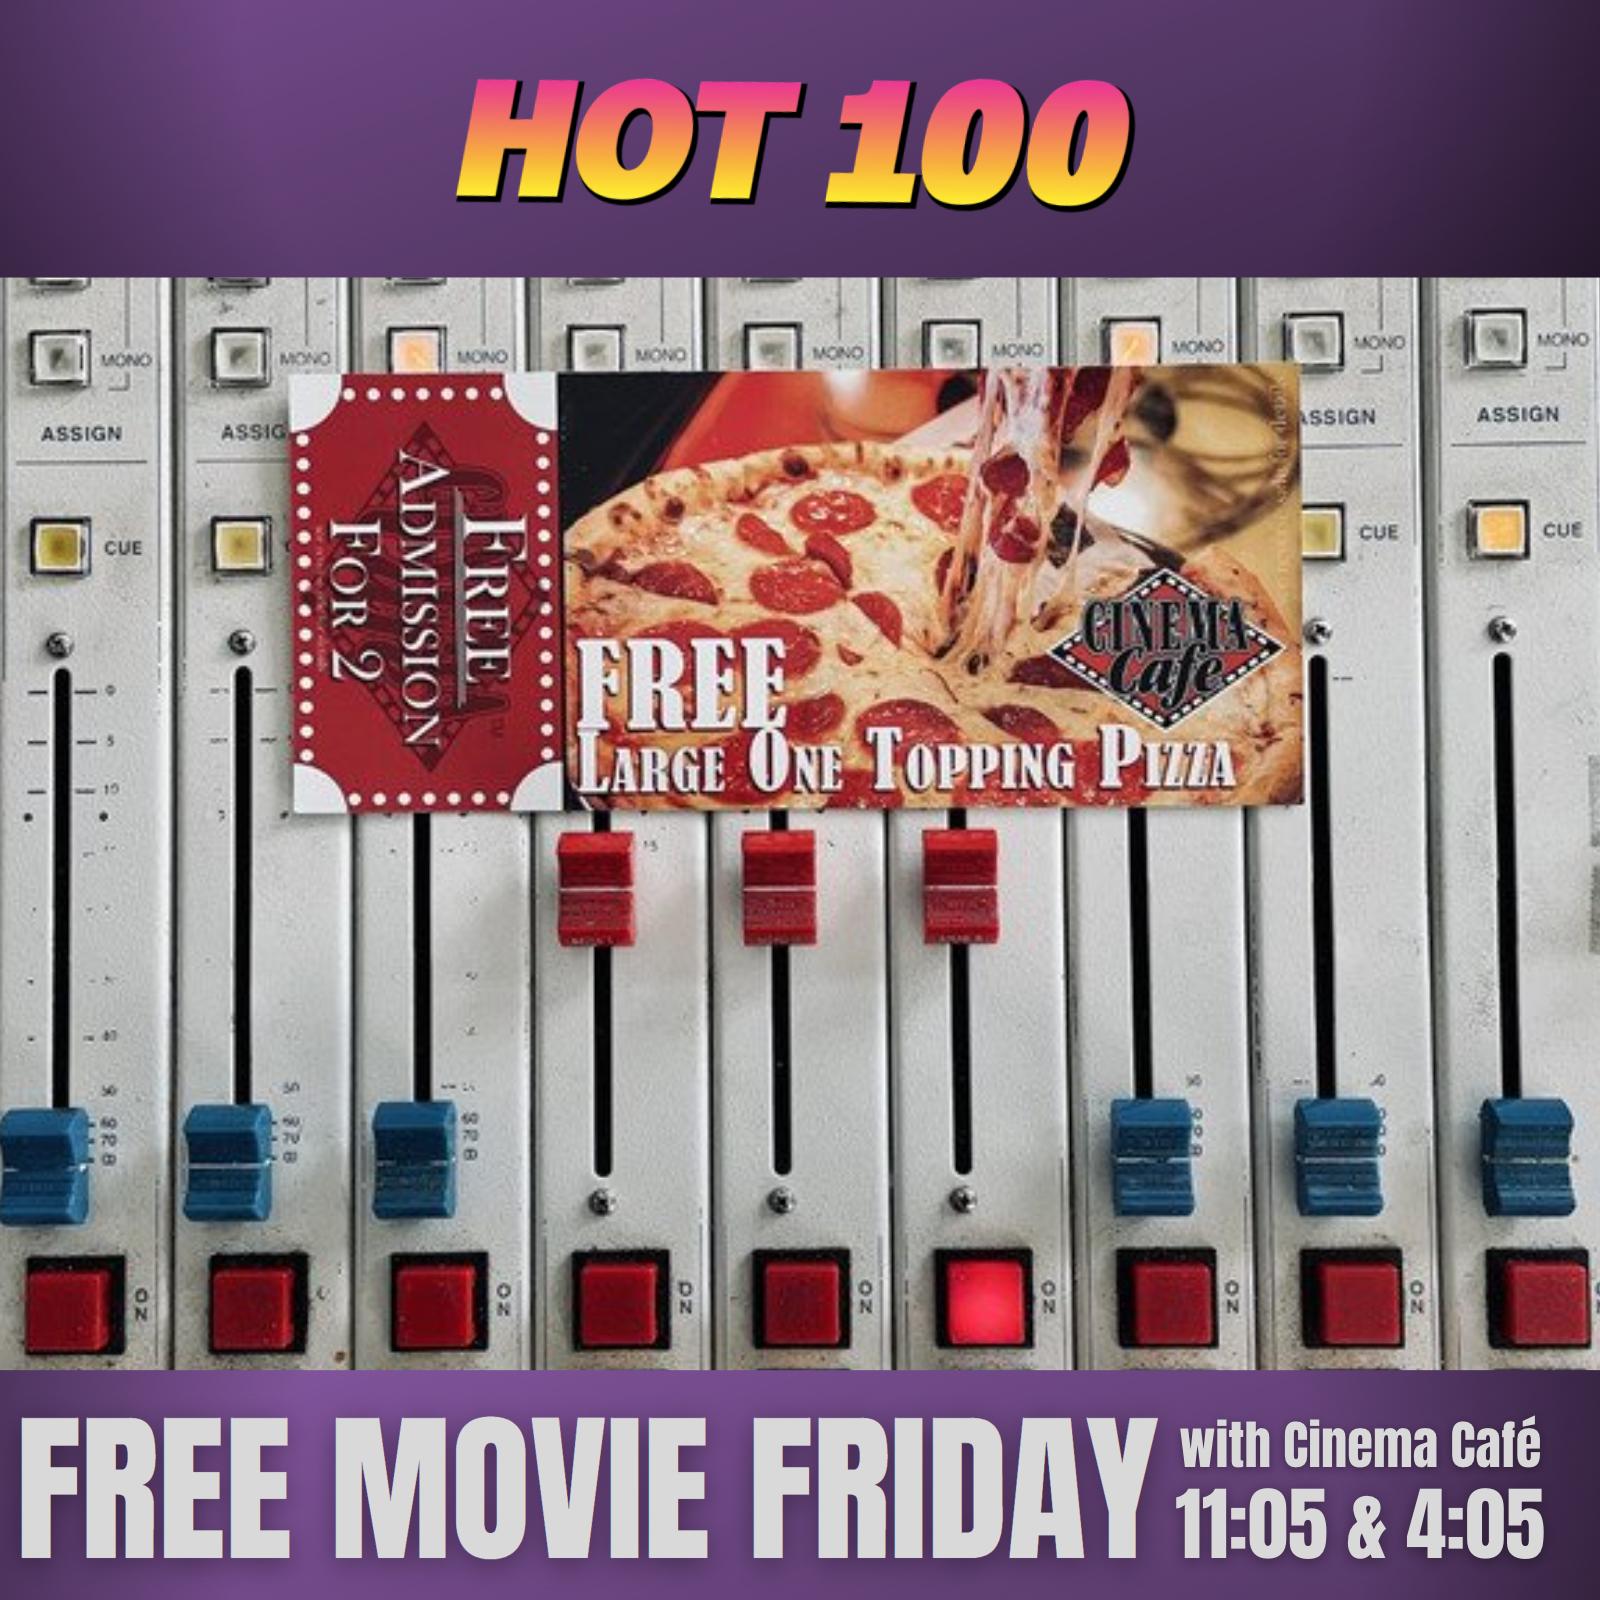 Free Movie Friday